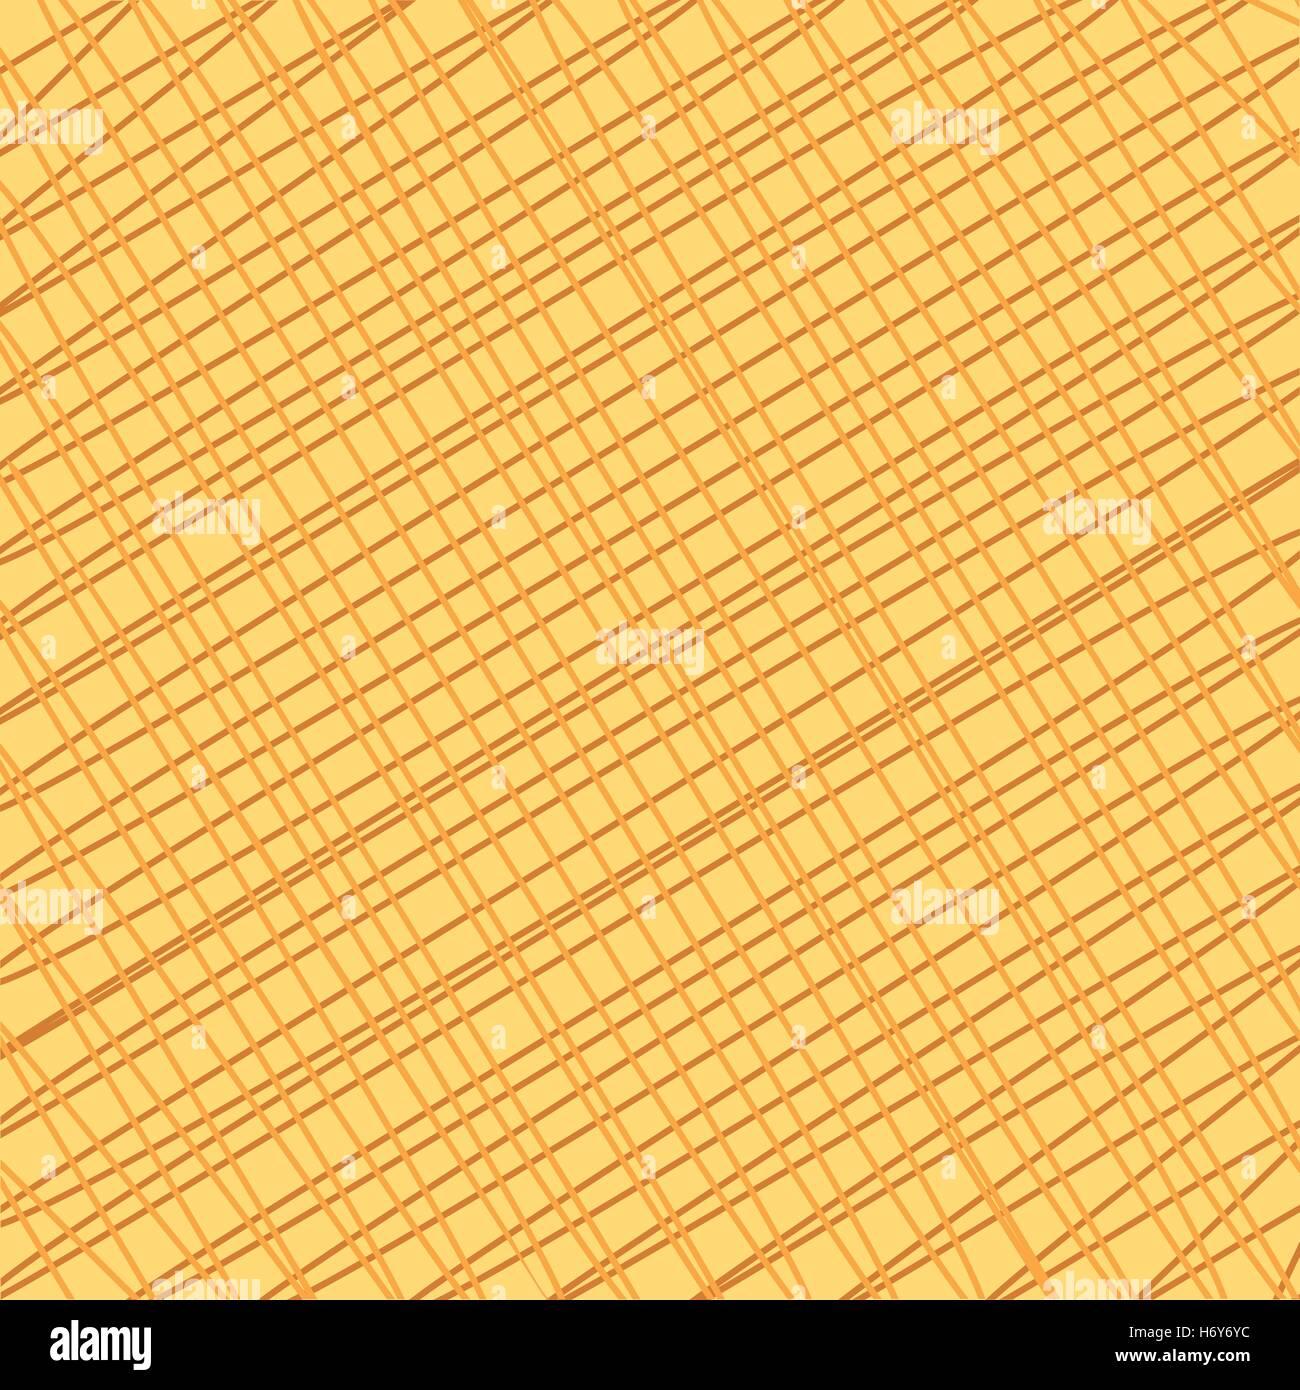 Textile braided background thread  fabric. Vector illustration. - Stock Vector